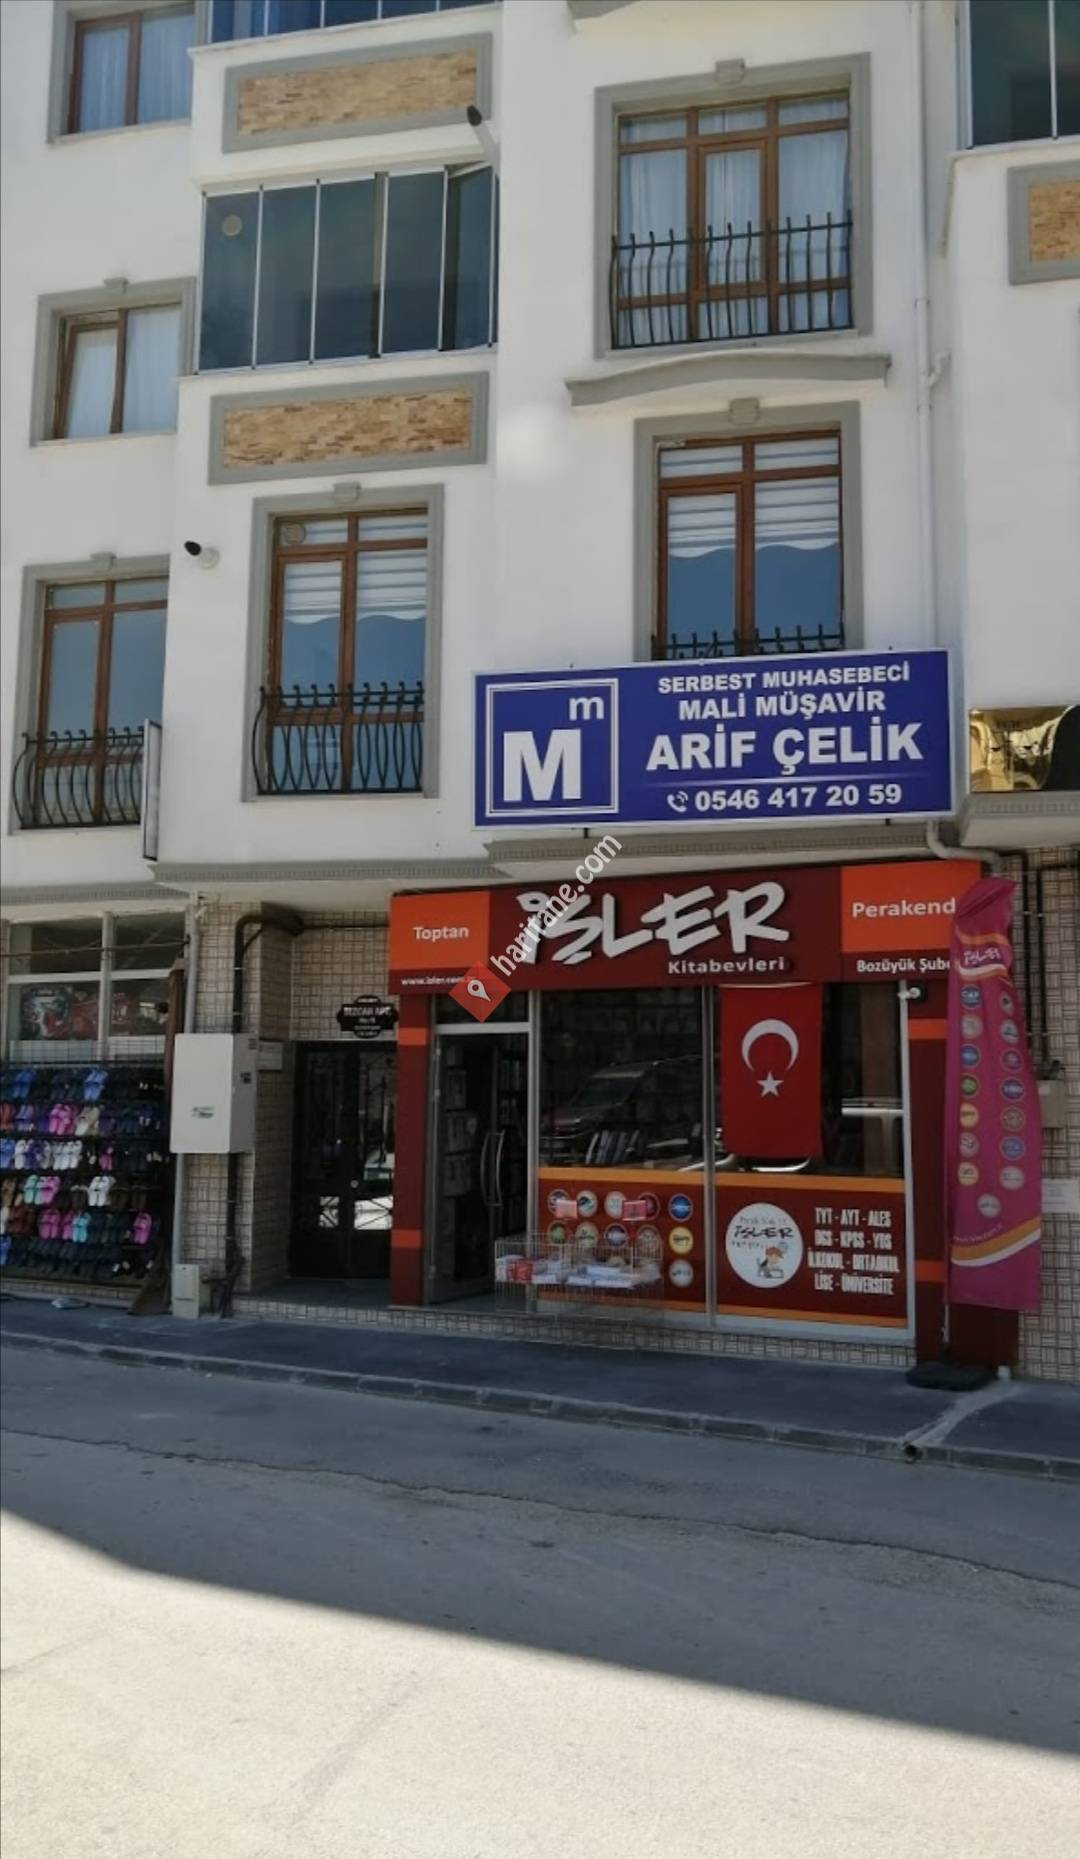 SMMM ARİF ÇELİK - SERBEST MUHASEBECİ MALİ MÜŞAVİR